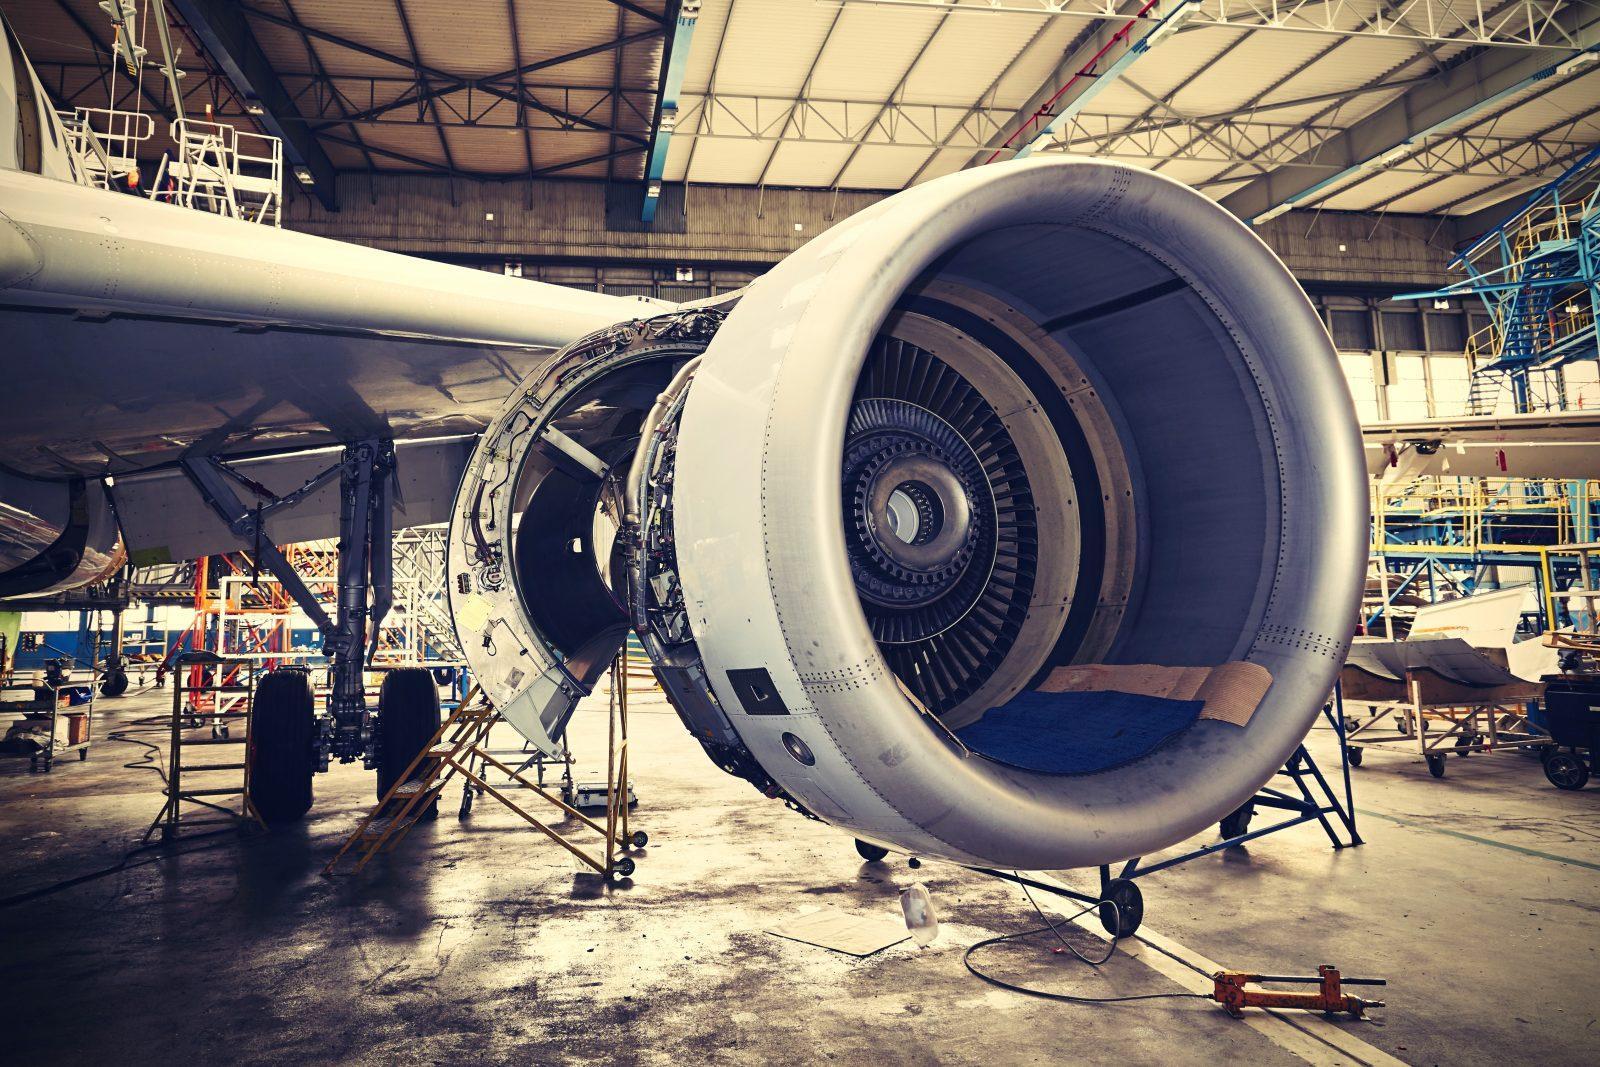 Engine of the airplane under heavy maintenance